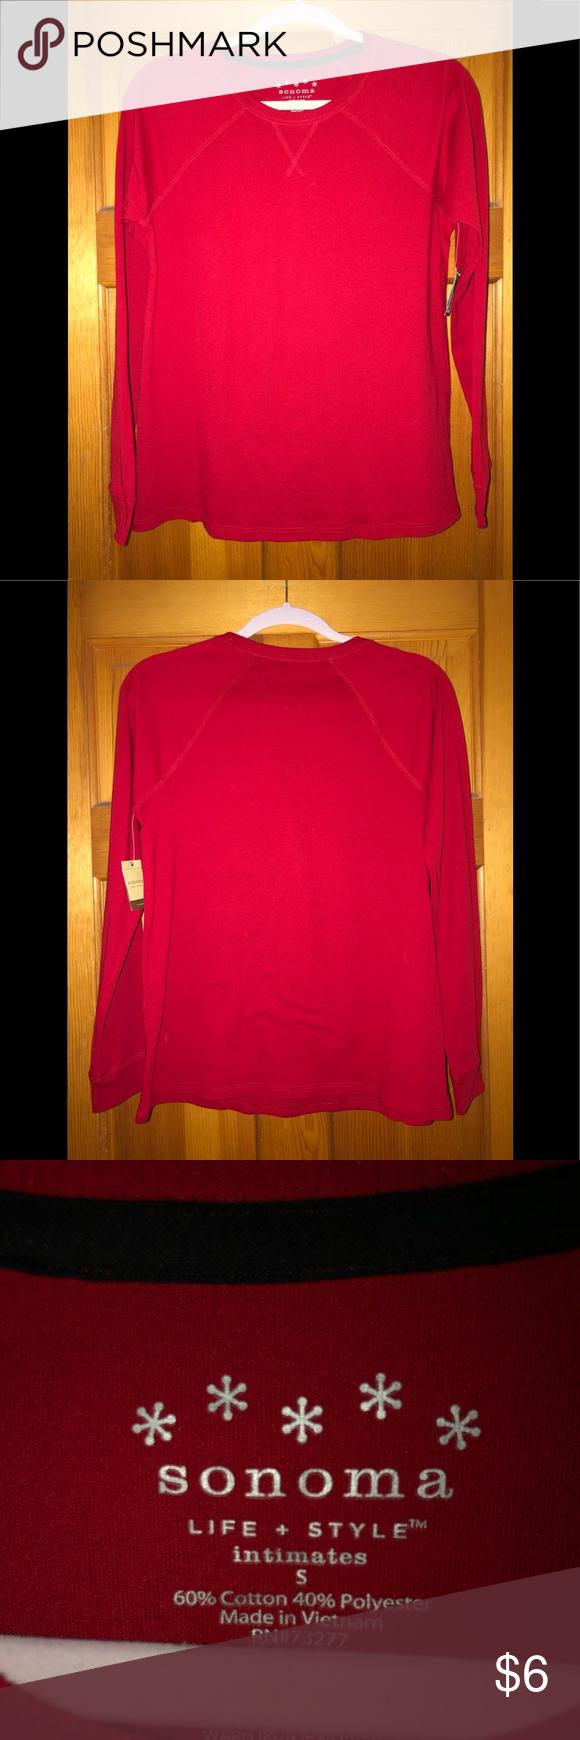 NWT Sonoma Intimates Sleep Shirt Sleep shirt, Intimates